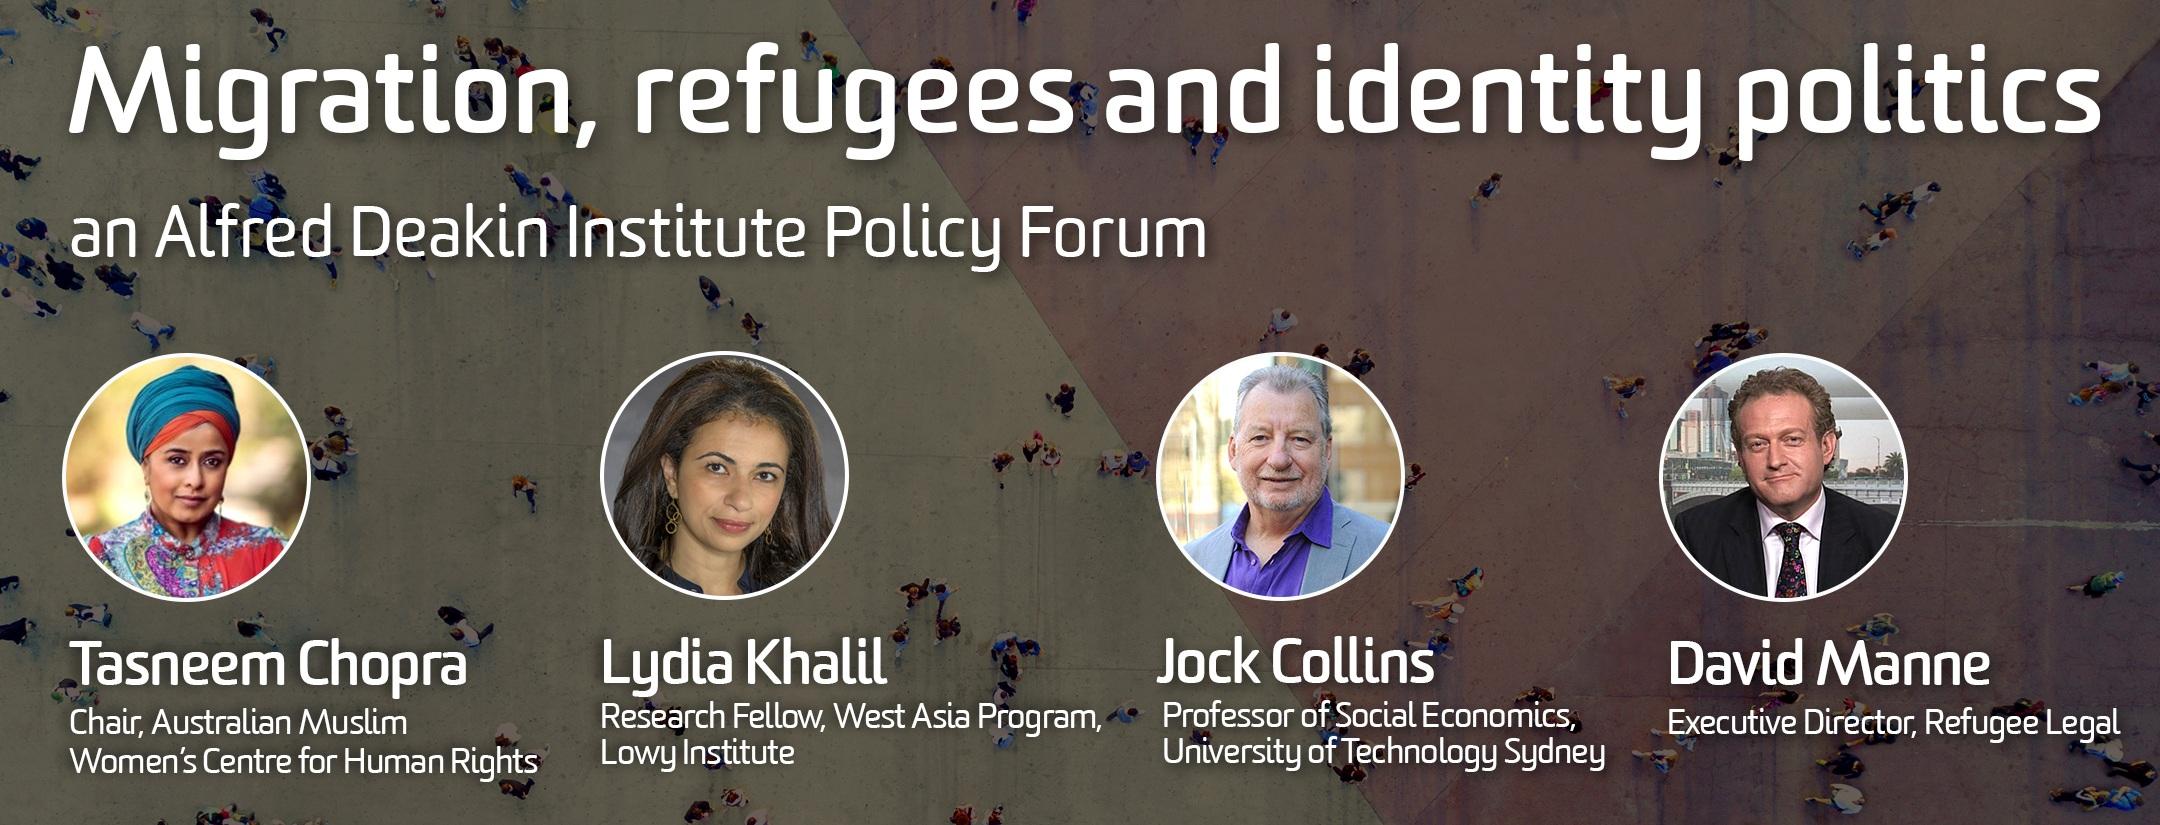 ADI+Policy+forum+1+-+web+banner+FINAL.jpg